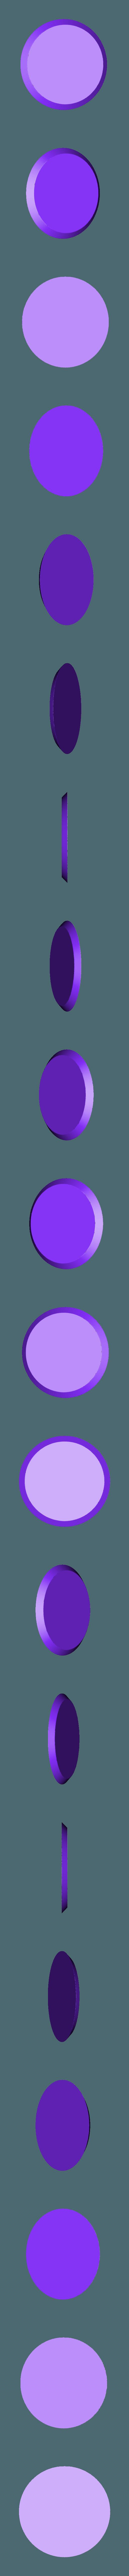 Hyper_Minis_Base_Large.stl Download free STL file Chibi Lord Knight Lander | Ragnarok Online Fan Art • 3D printing object, HyperMiniatures